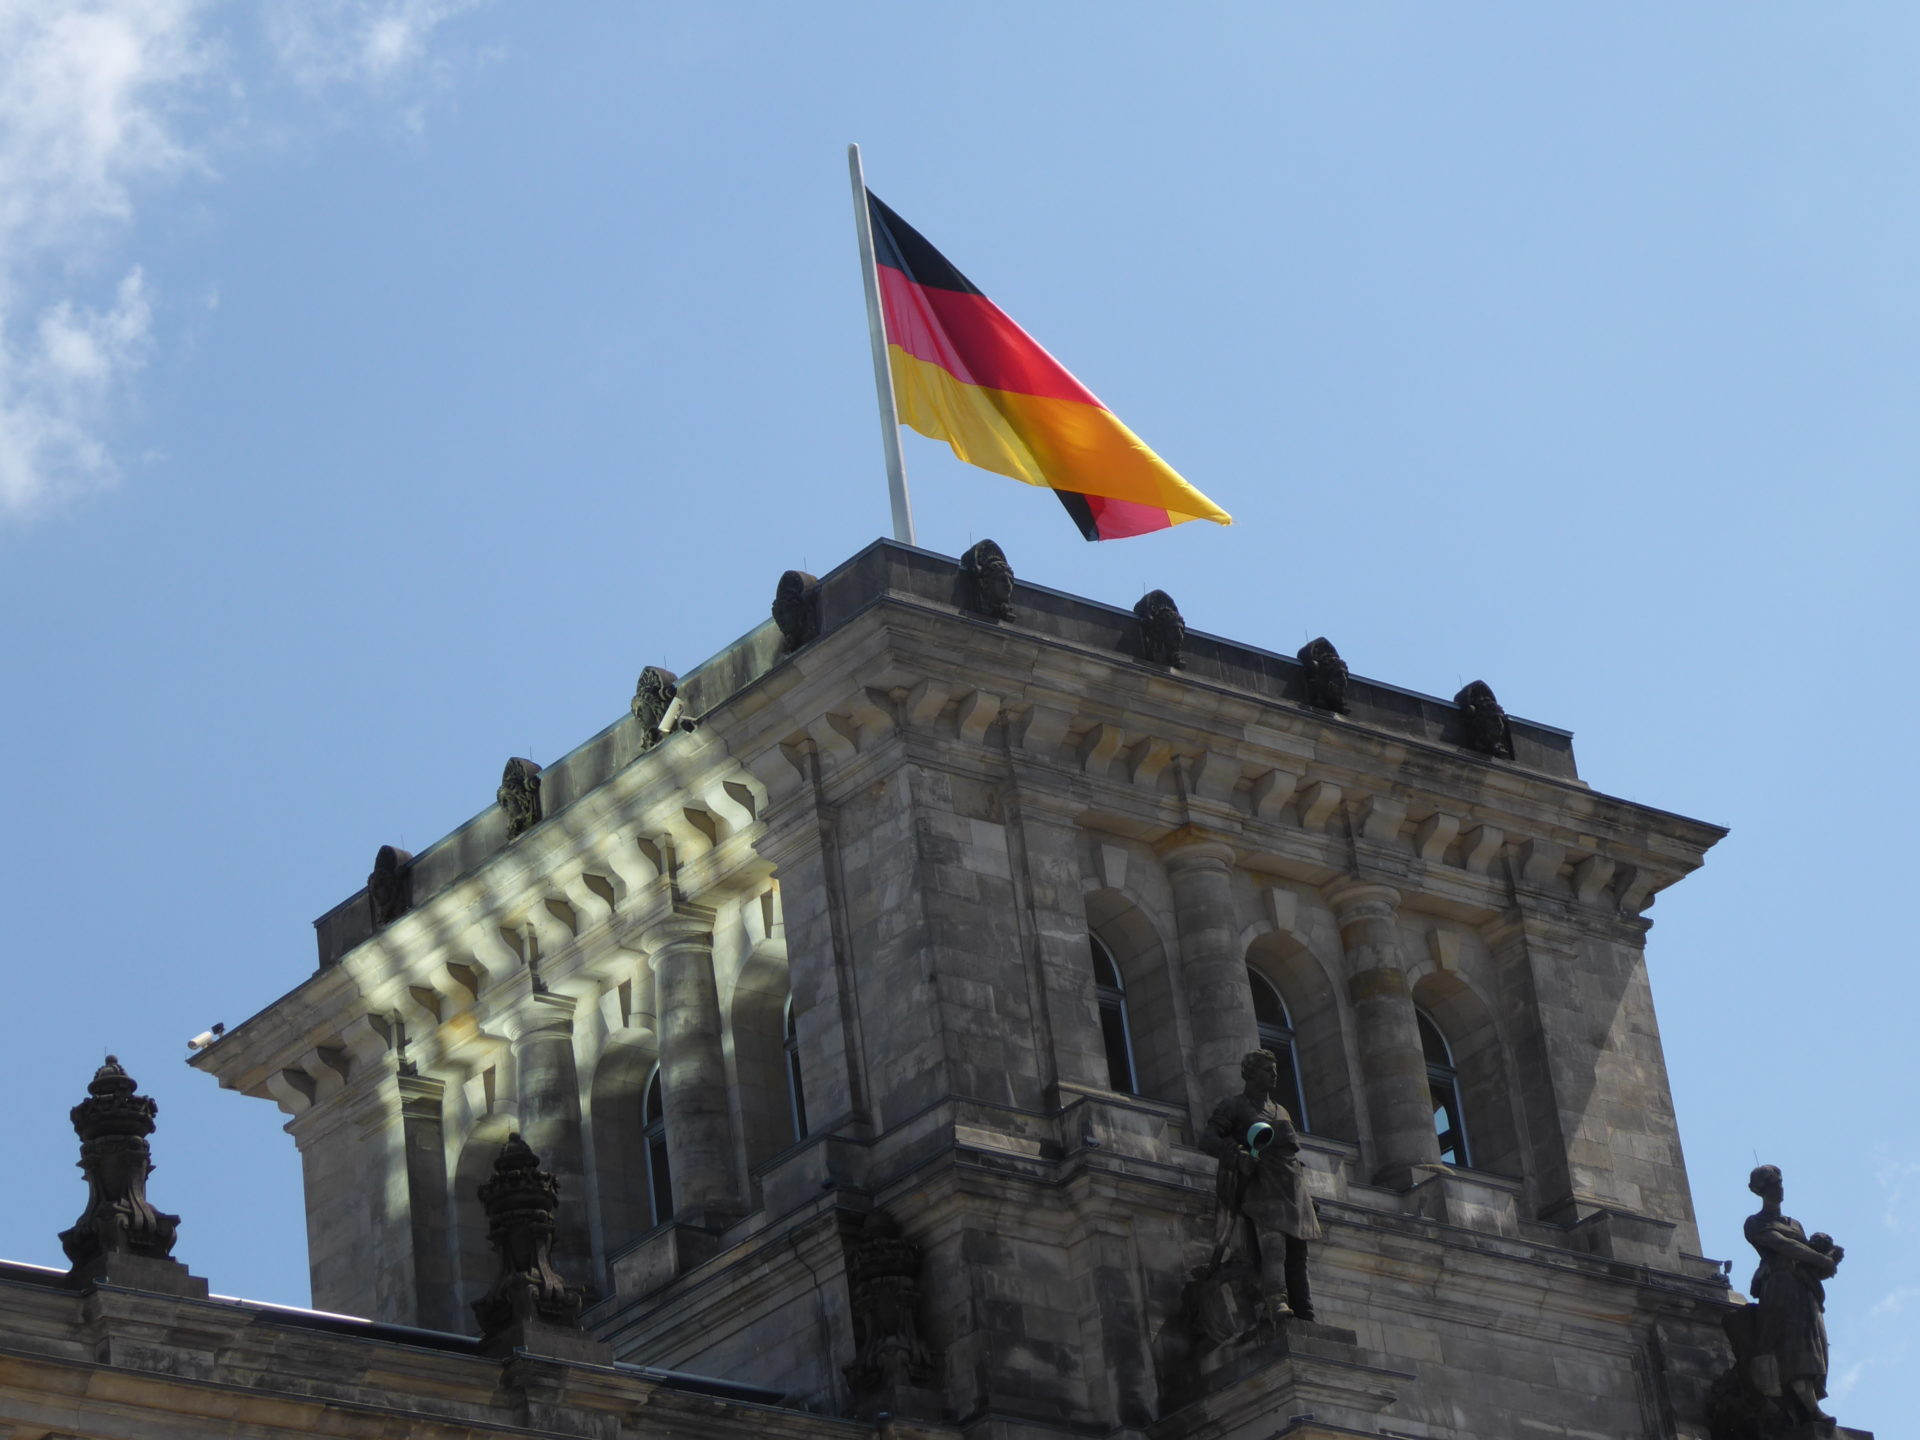 The Reichstag Berlin